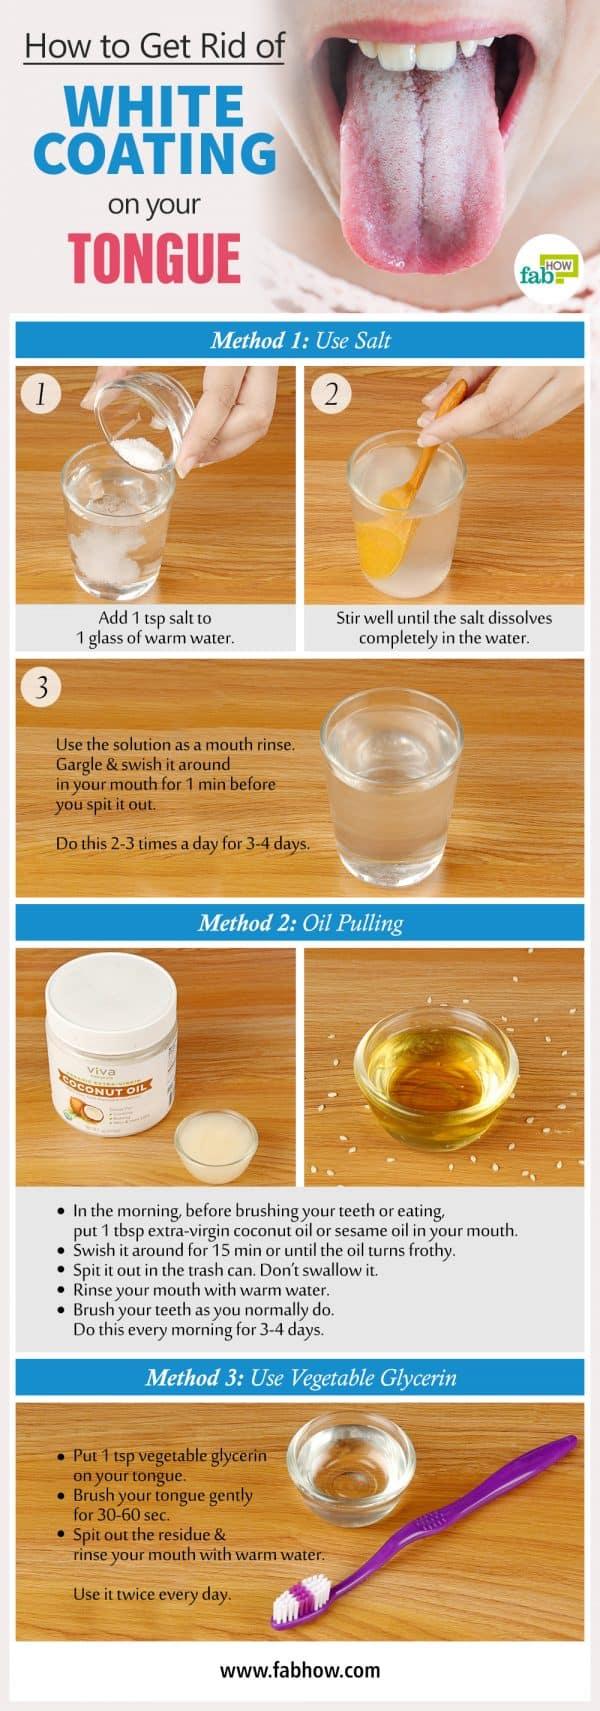 pics Yogurt Diet Tips and Benefits